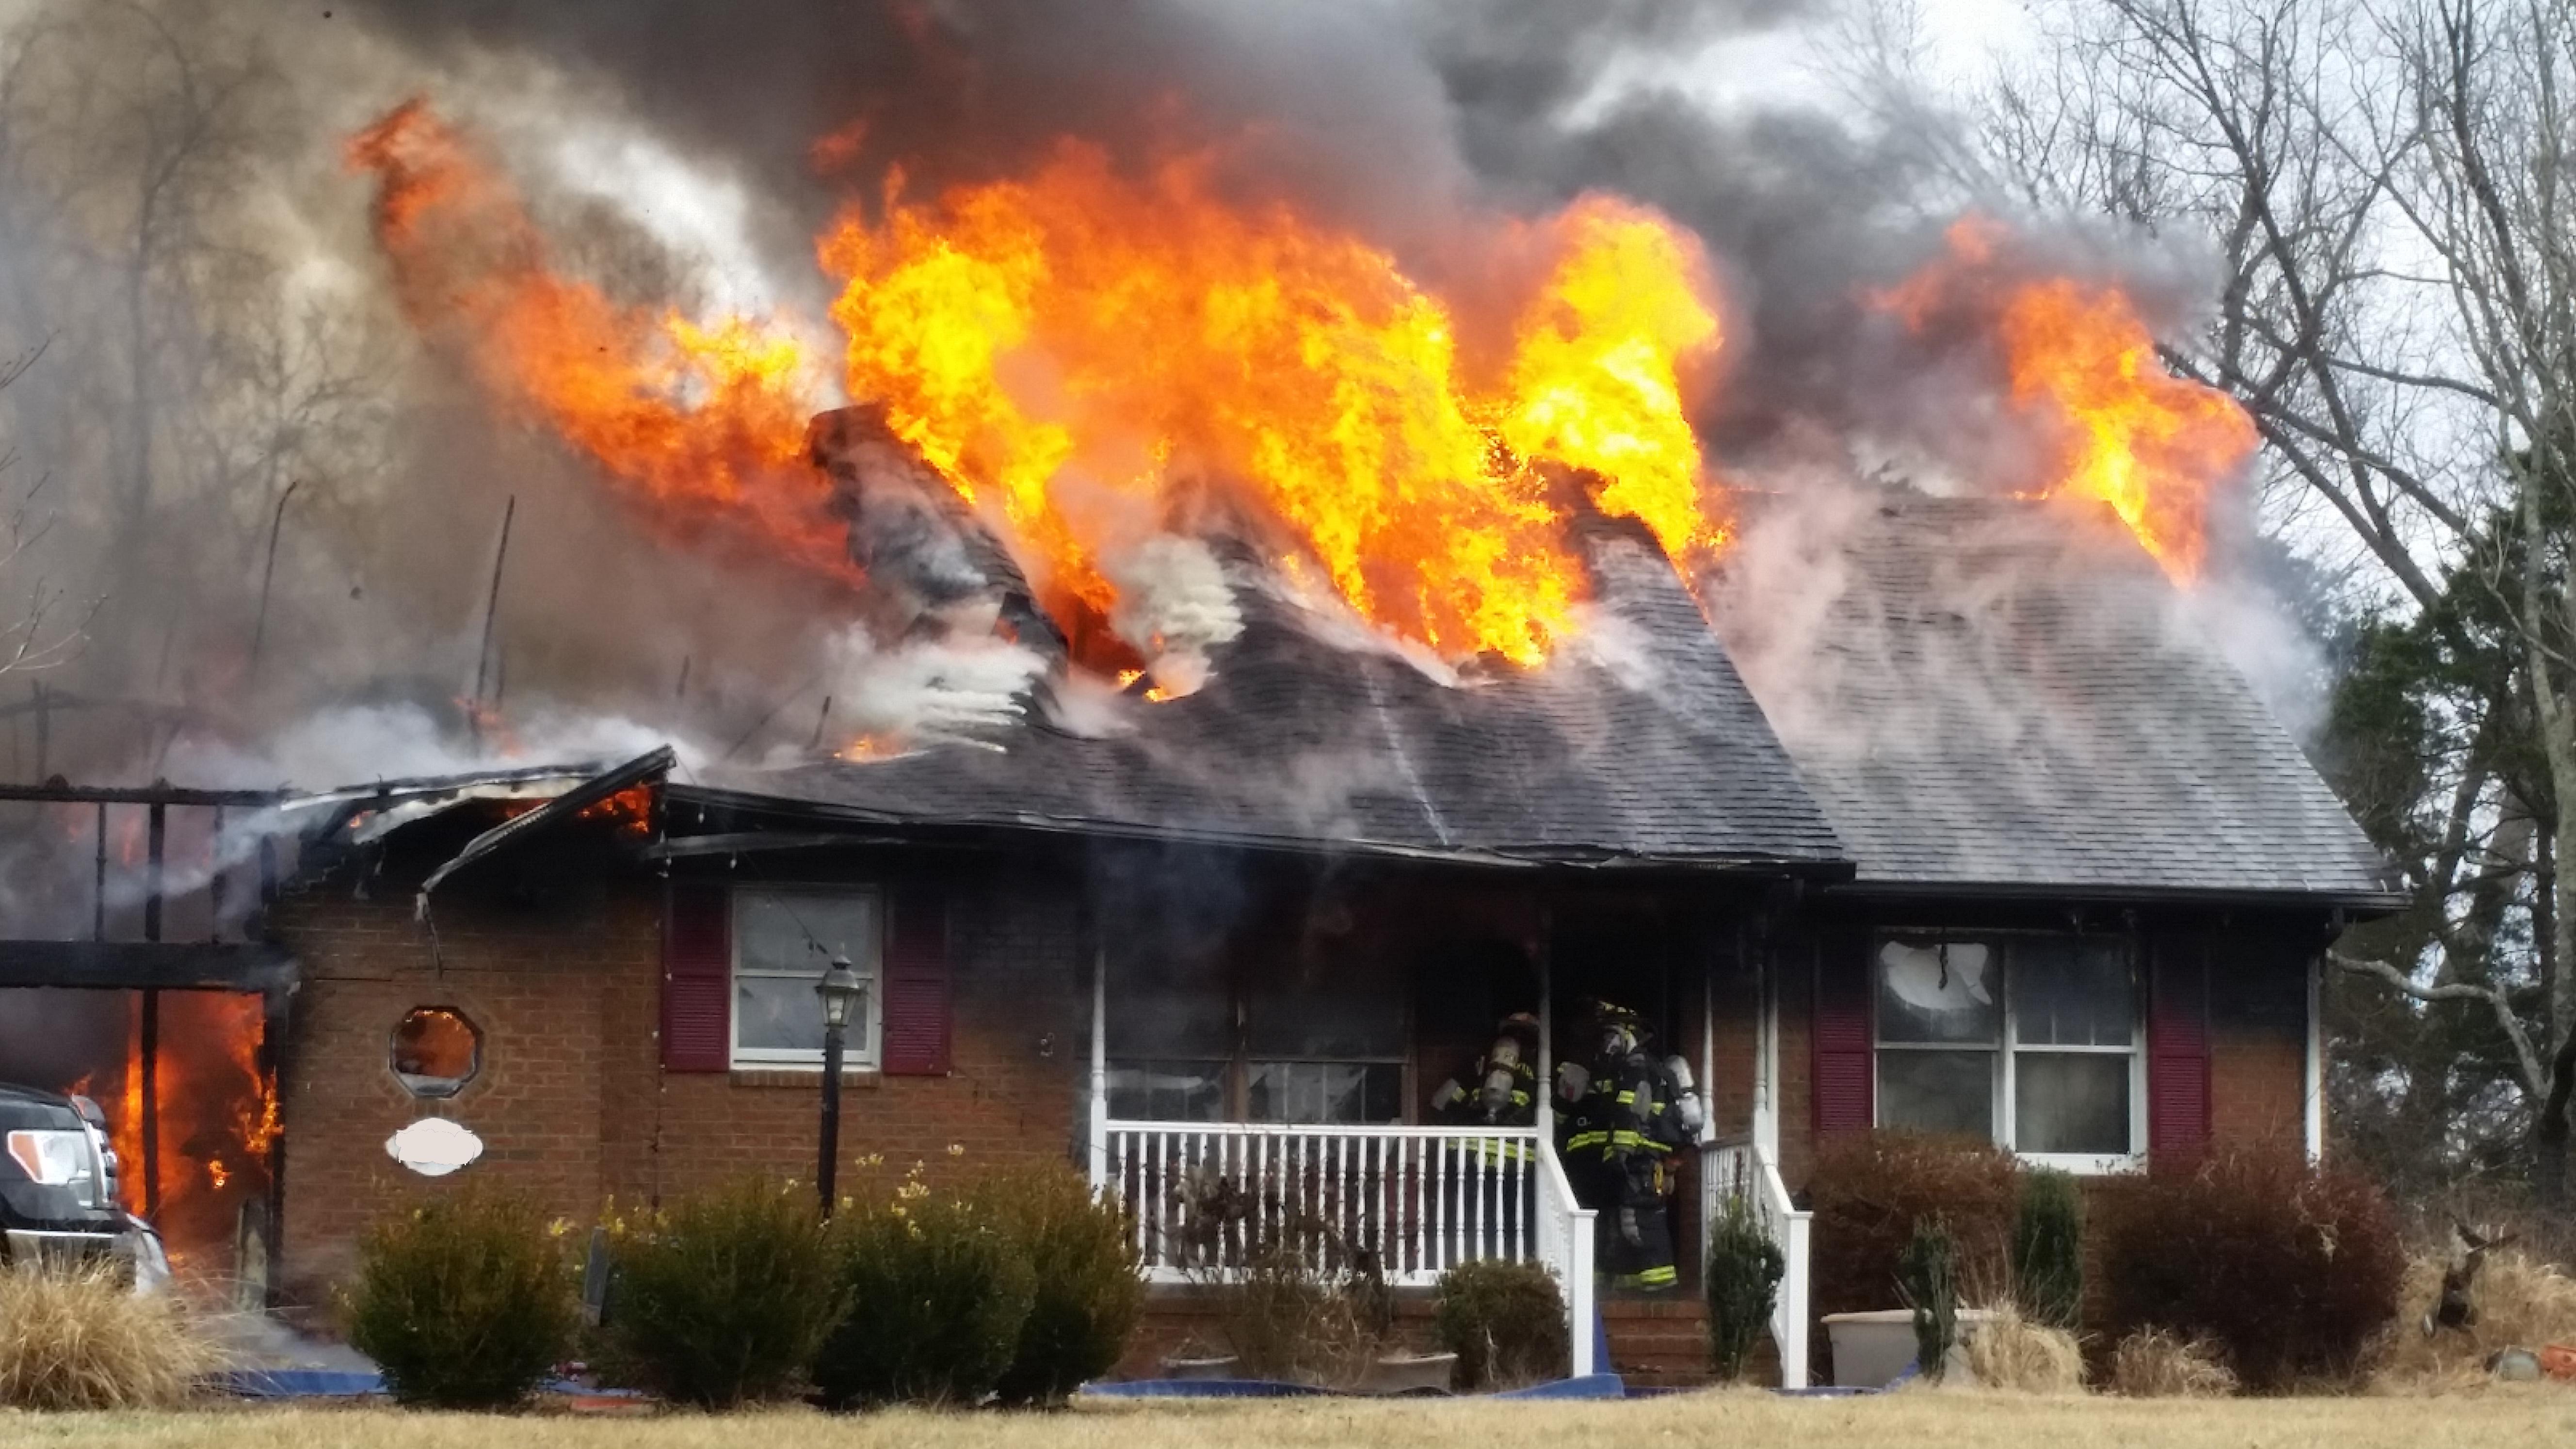 Structure Fire Porch Rd Warrenton Vol Fire Co